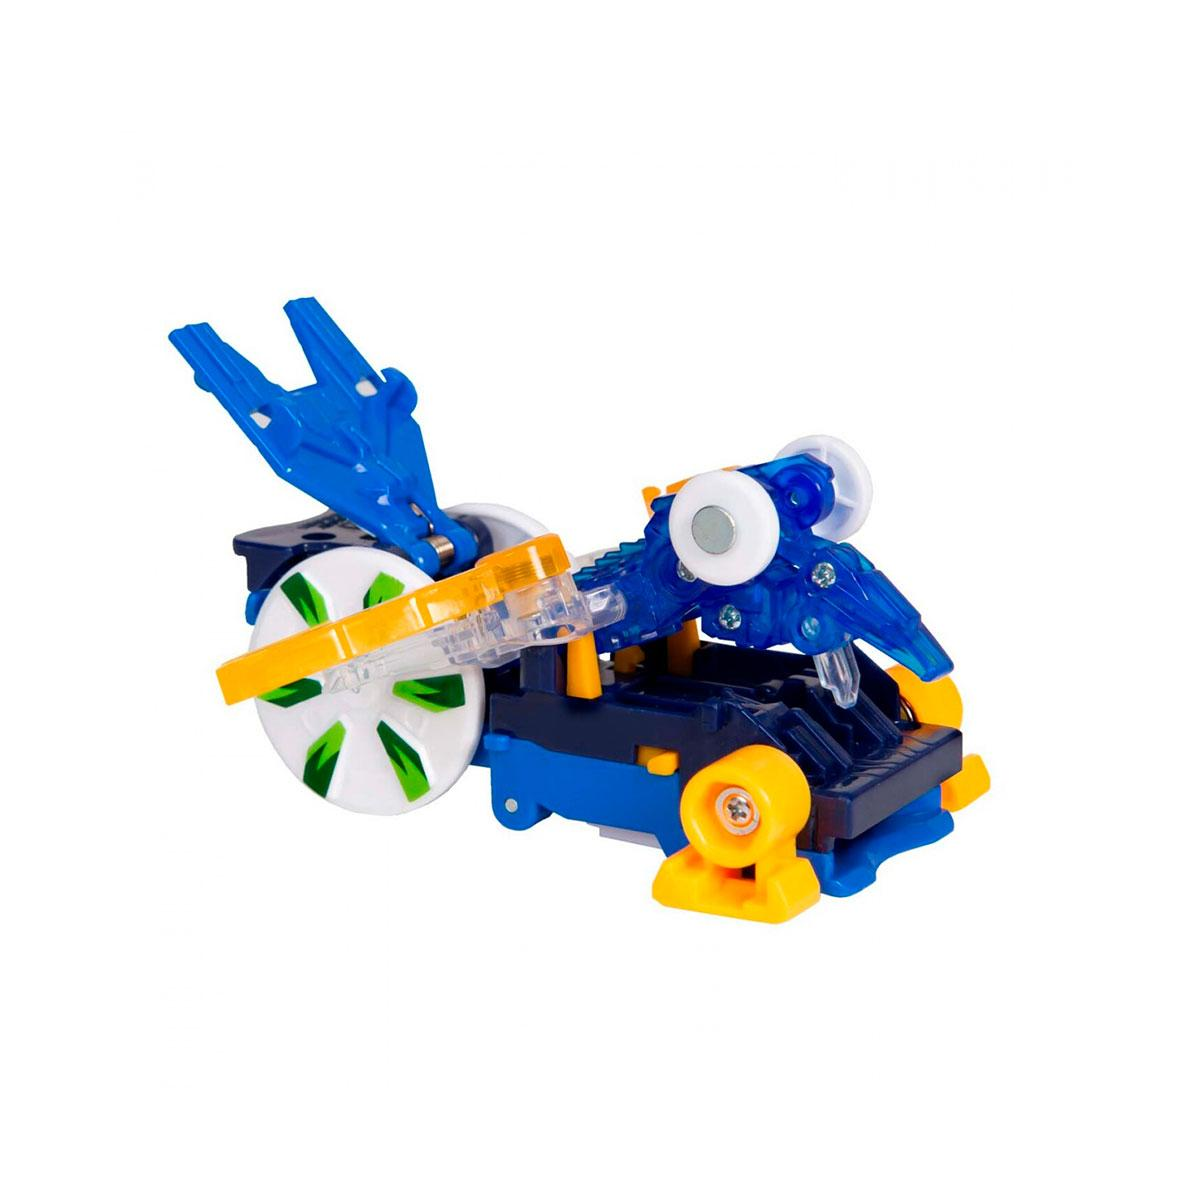 Машинка-трансформер Screechers Wild! S2 L1 - Шедоу Вінд EU684101